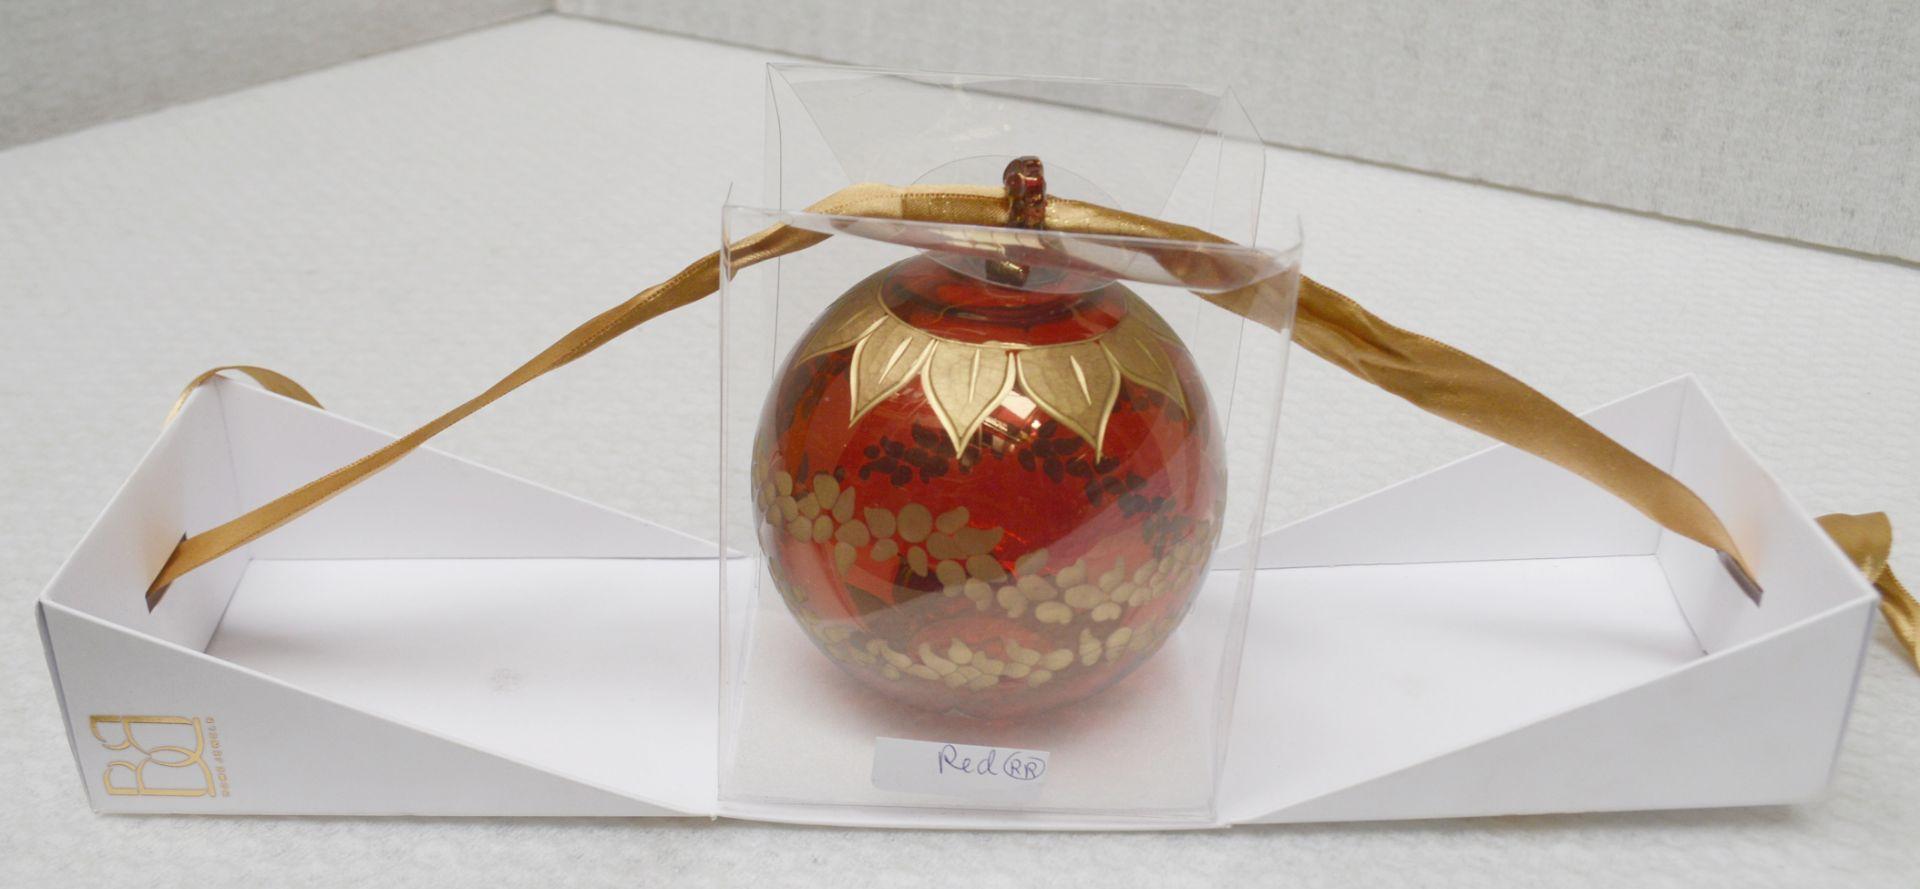 1 x BALDI 'Home Jewels' Italian Hand-crafted Artisan Christmas Tree Decoration Original RRP £114.00 - Image 5 of 5